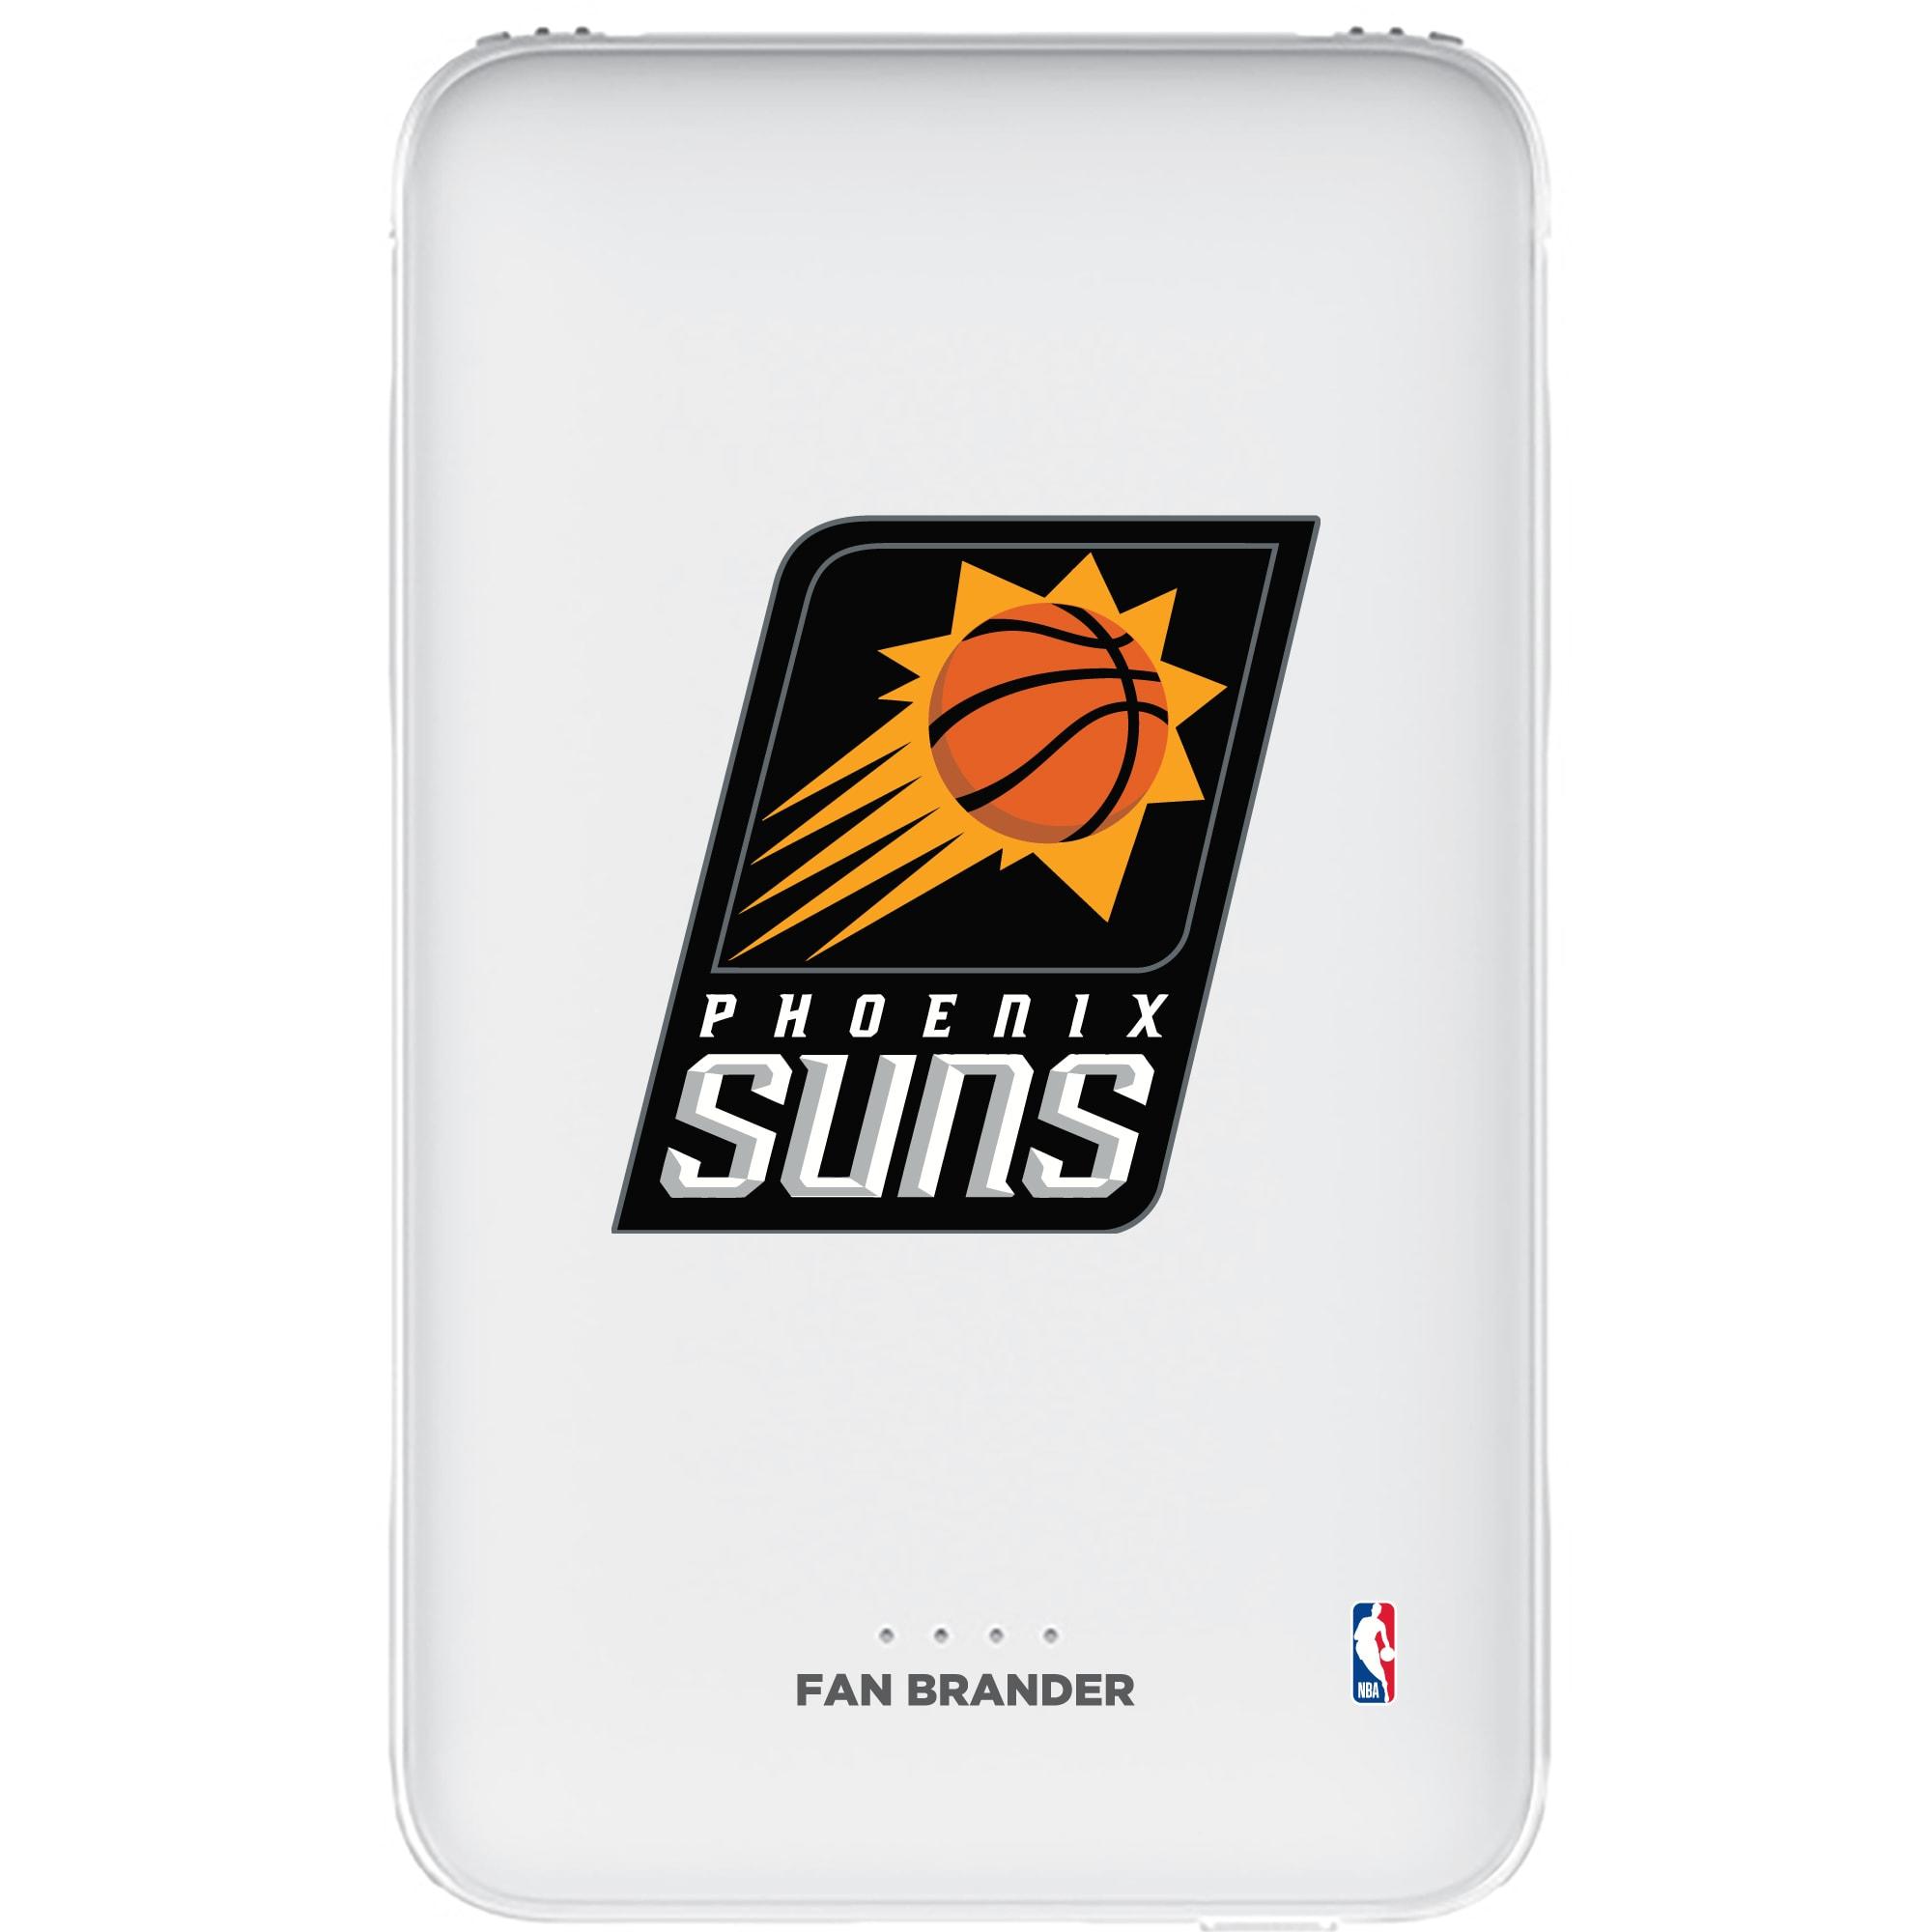 Phoenix Suns 5000mAh Portable Power Bank - White